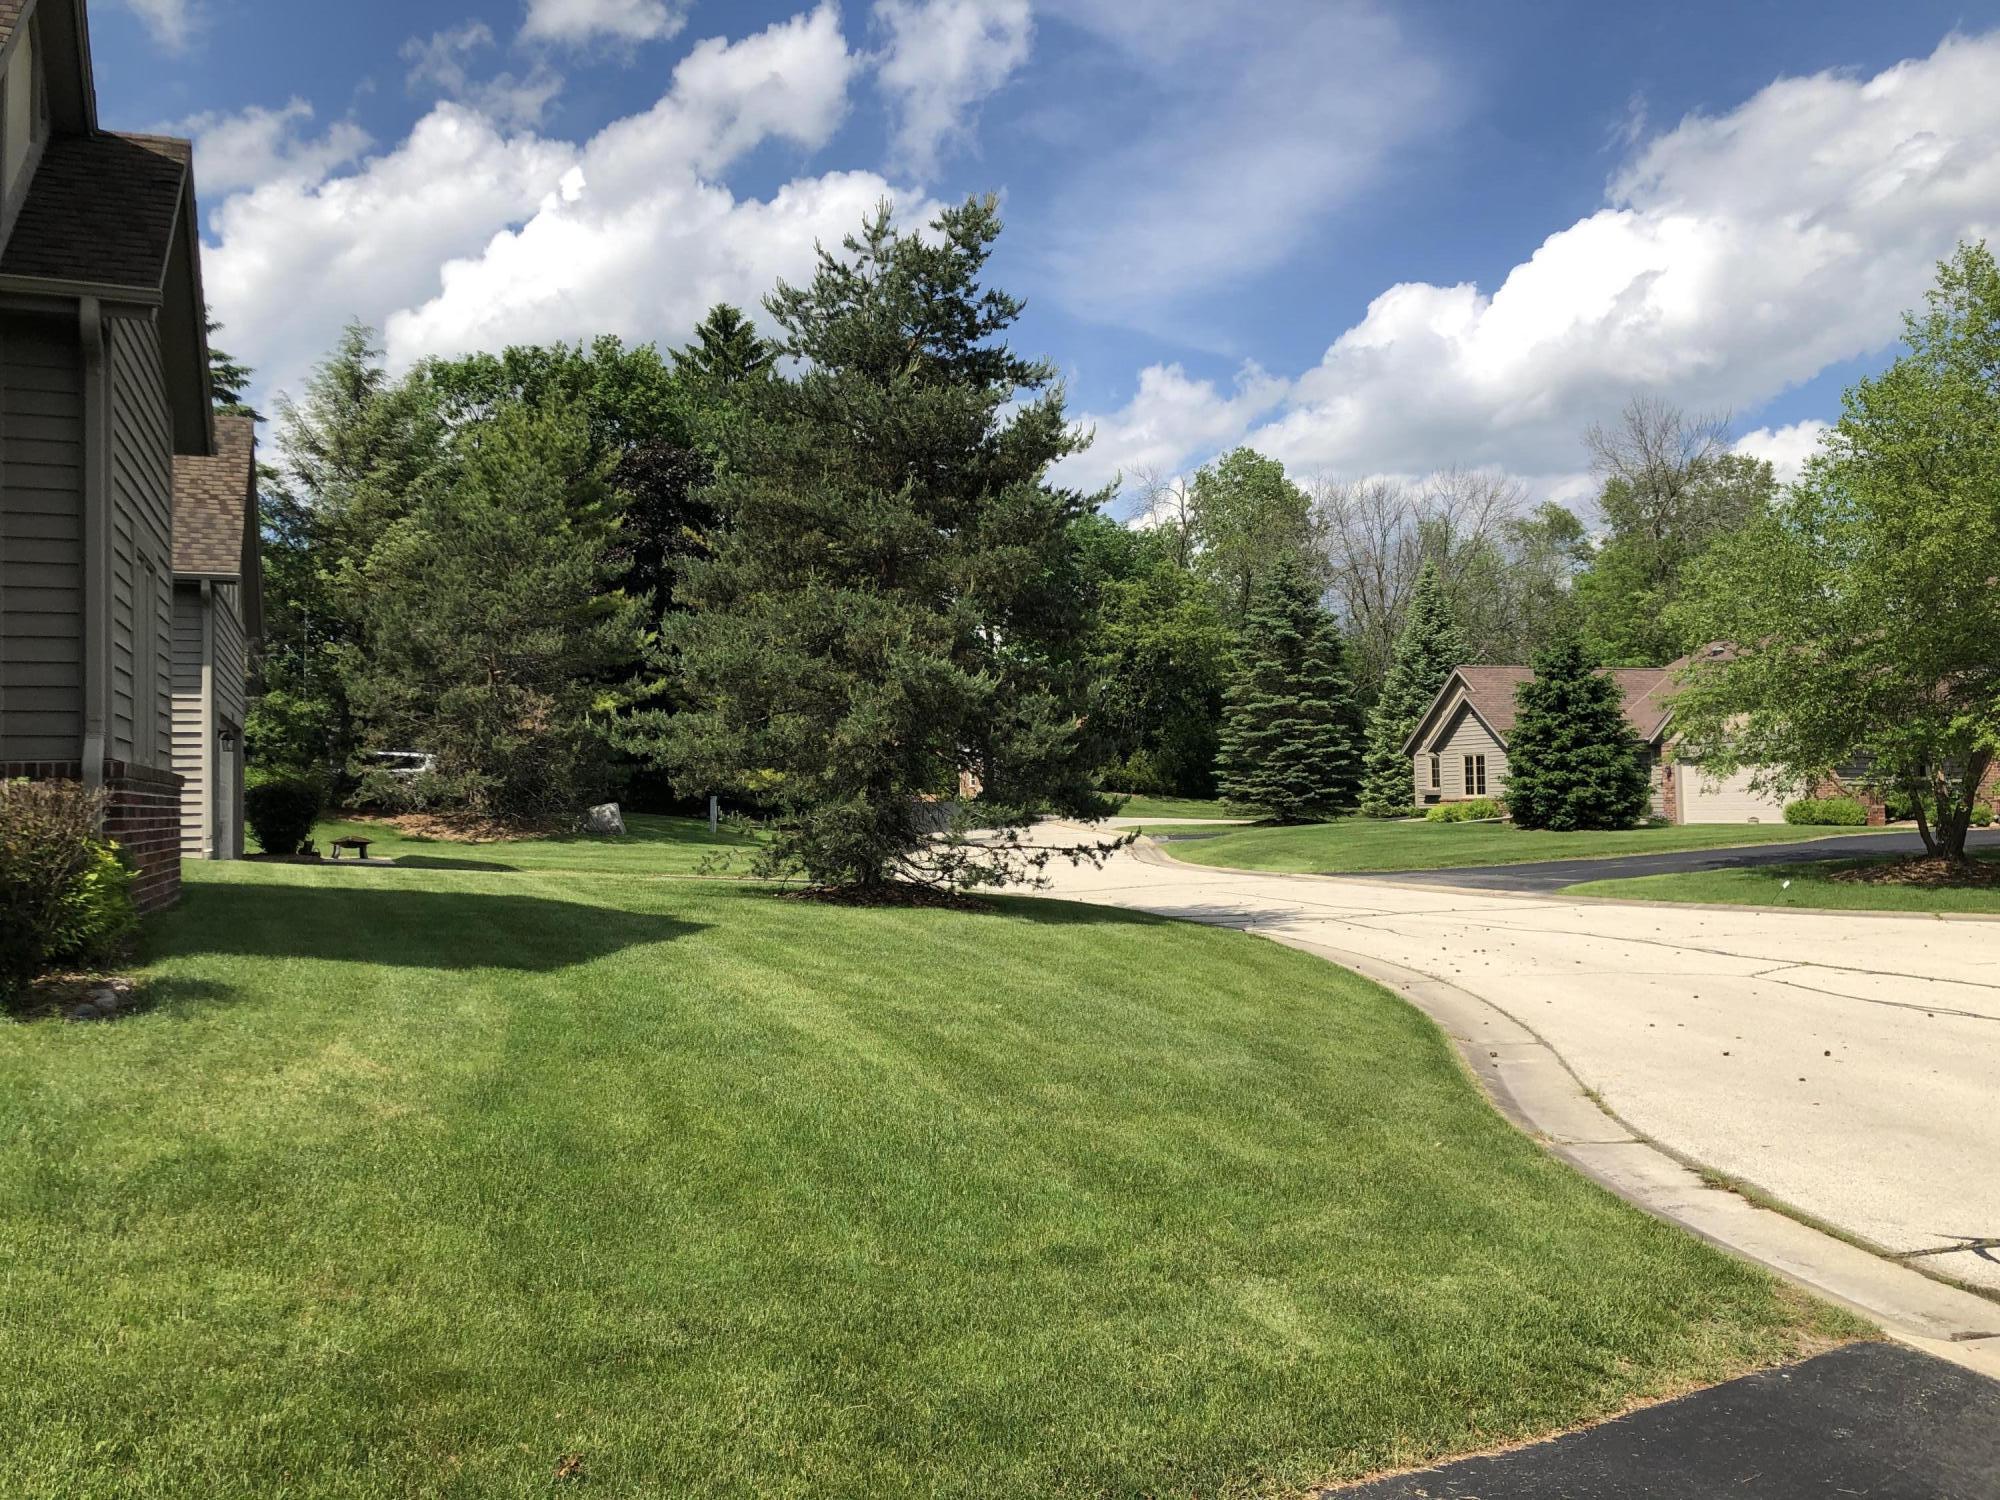 2865 Teal Ridge Ct, Brookfield, Wisconsin 53045, 3 Bedrooms Bedrooms, 6 Rooms Rooms,2 BathroomsBathrooms,Condominiums,For Sale,Teal Ridge Ct,1,1692546